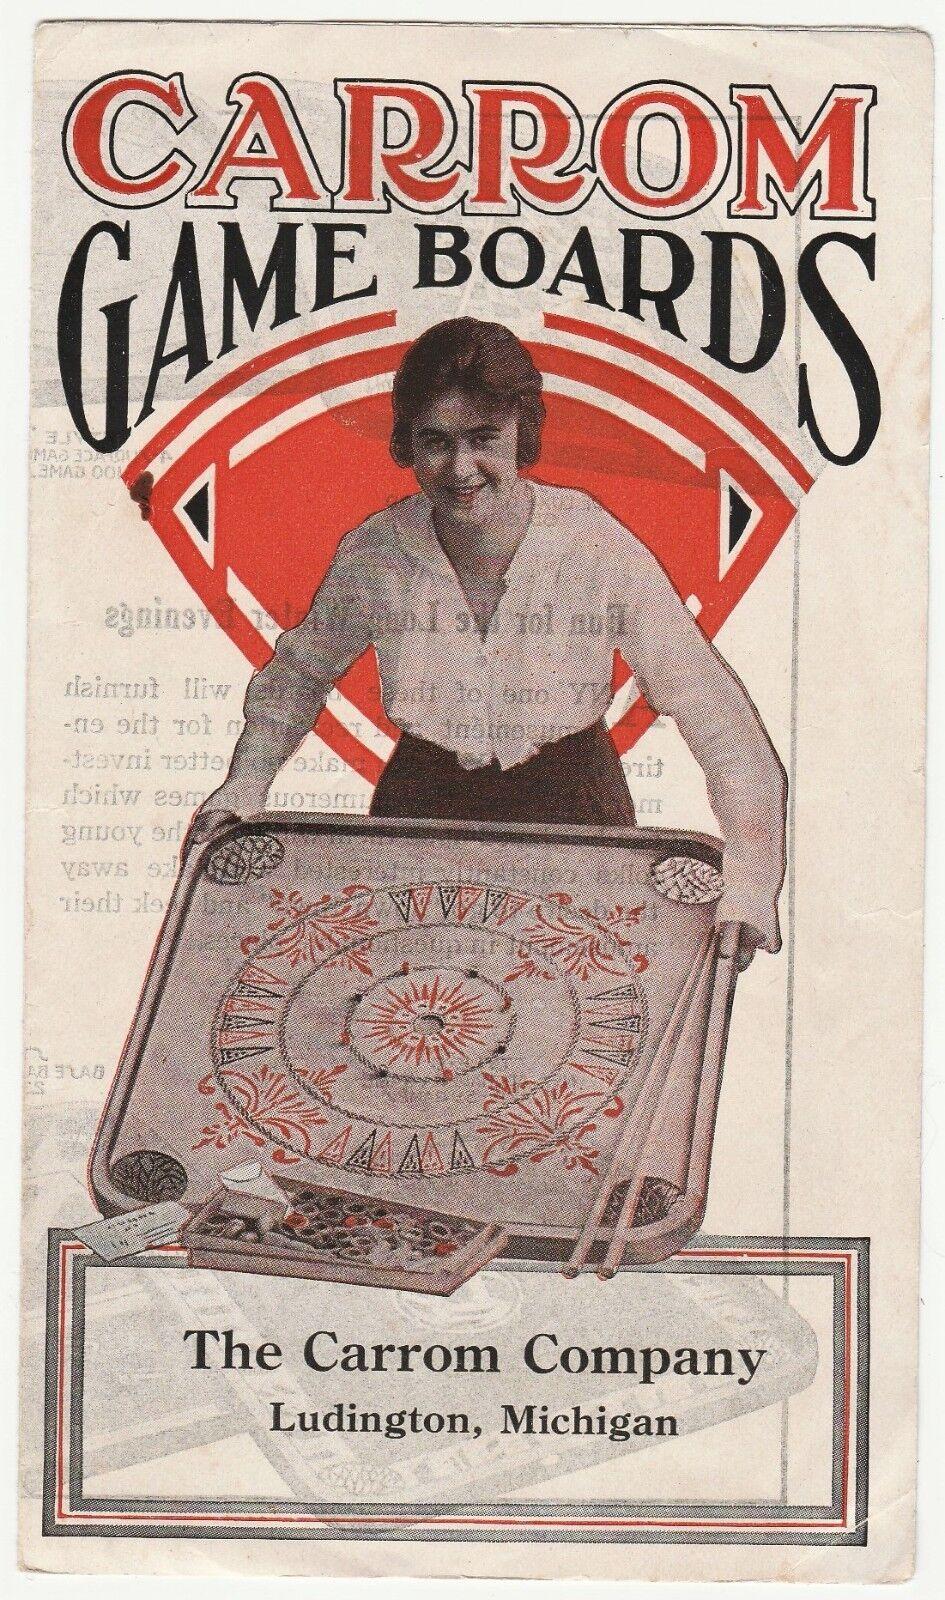 RARE Adverdeising Flyer Catalog - autorom gioco tavolas ca 1915  Pool Crokinole  sport caldi